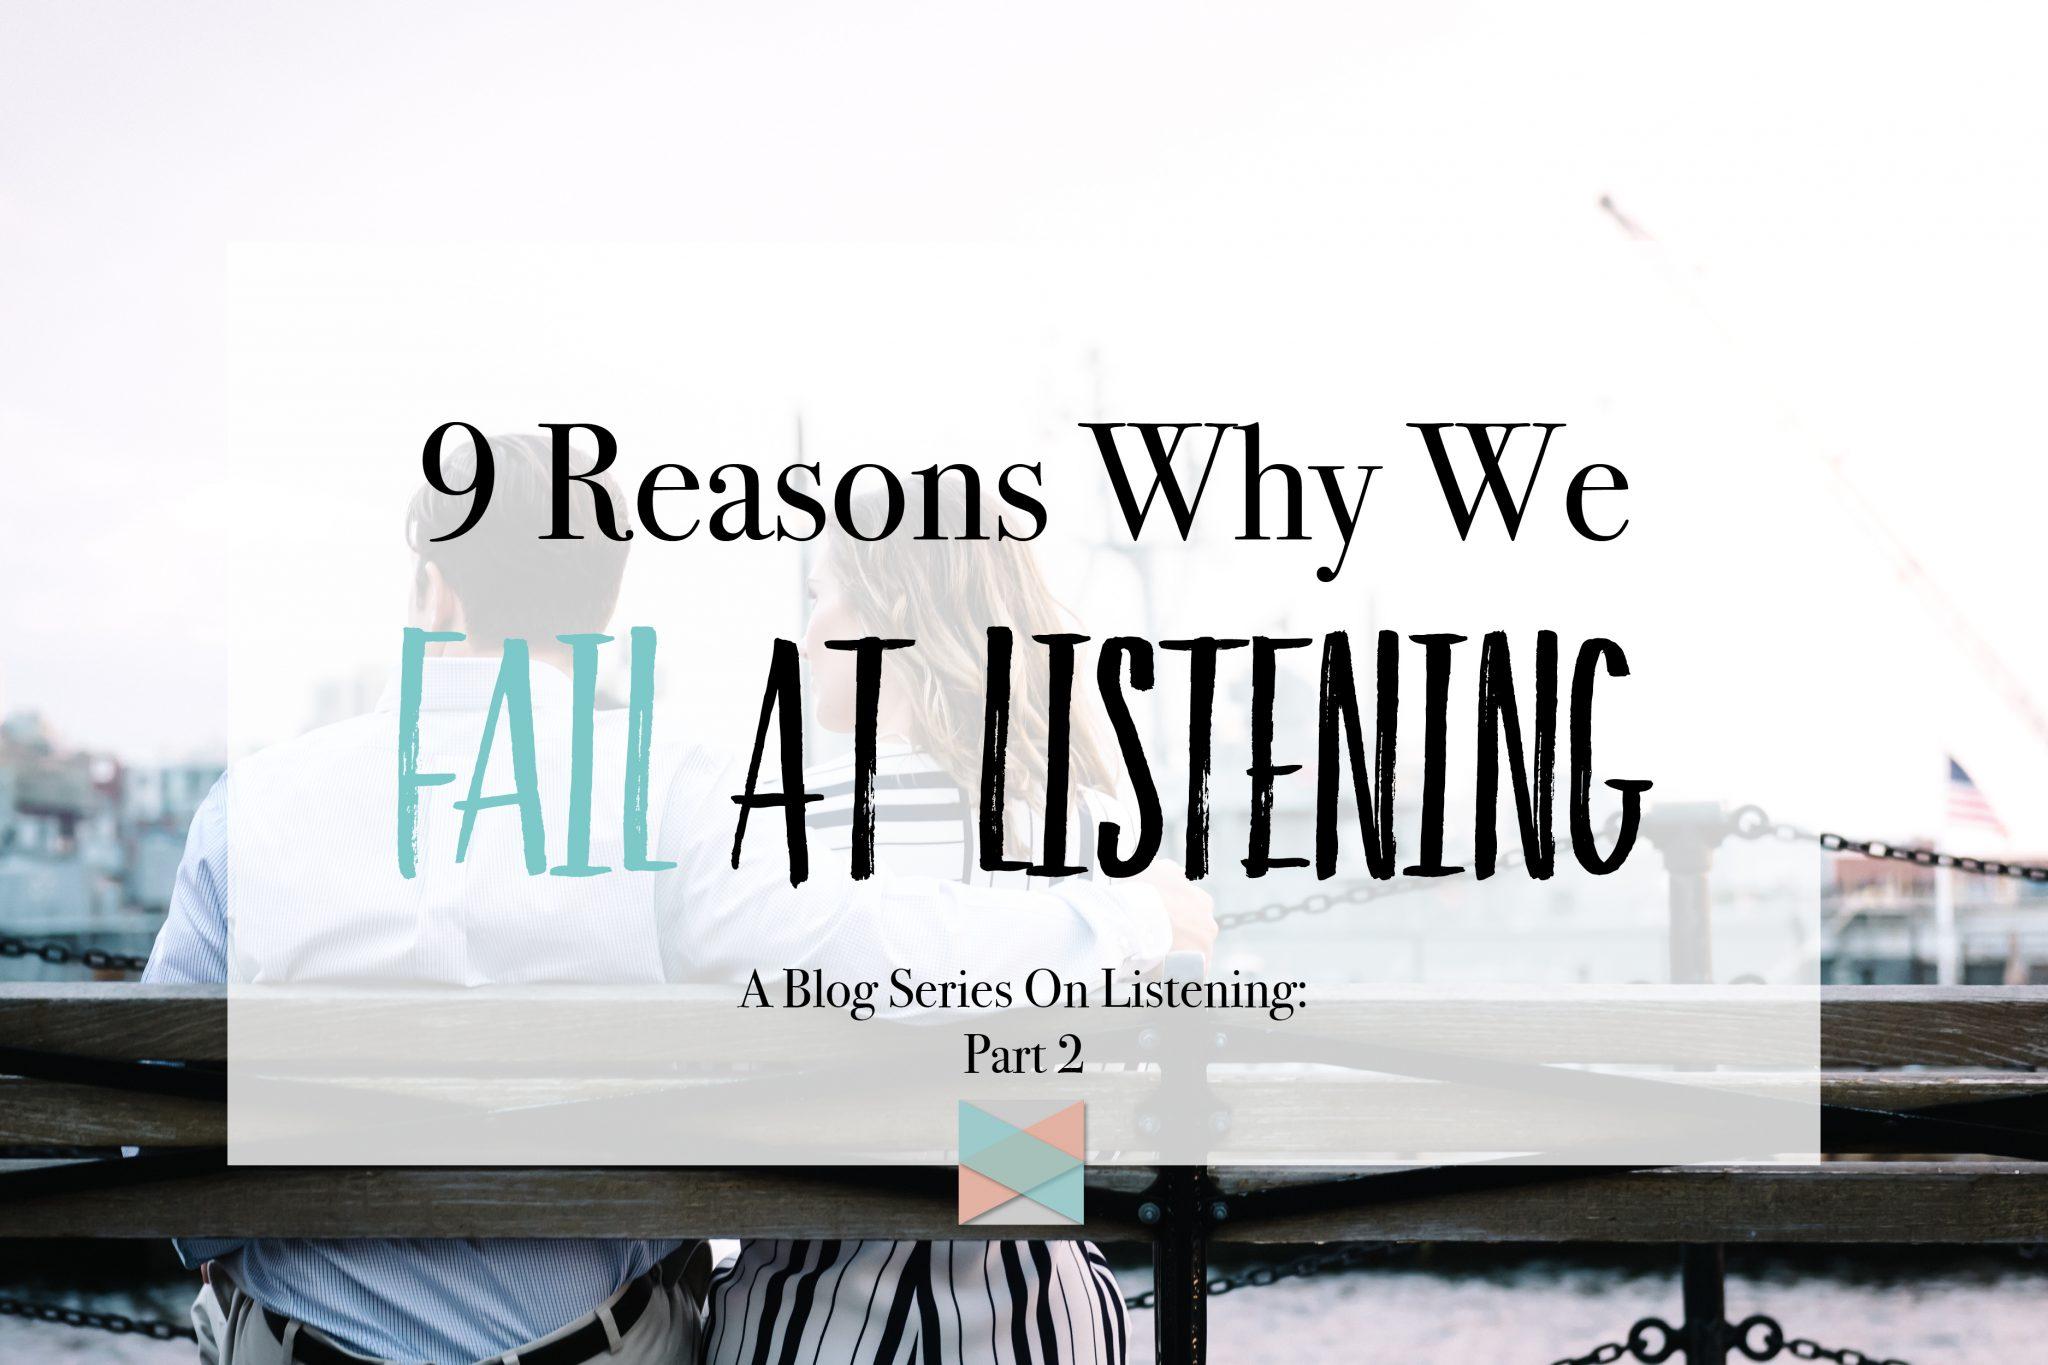 Reasons Why We Fail At Listening